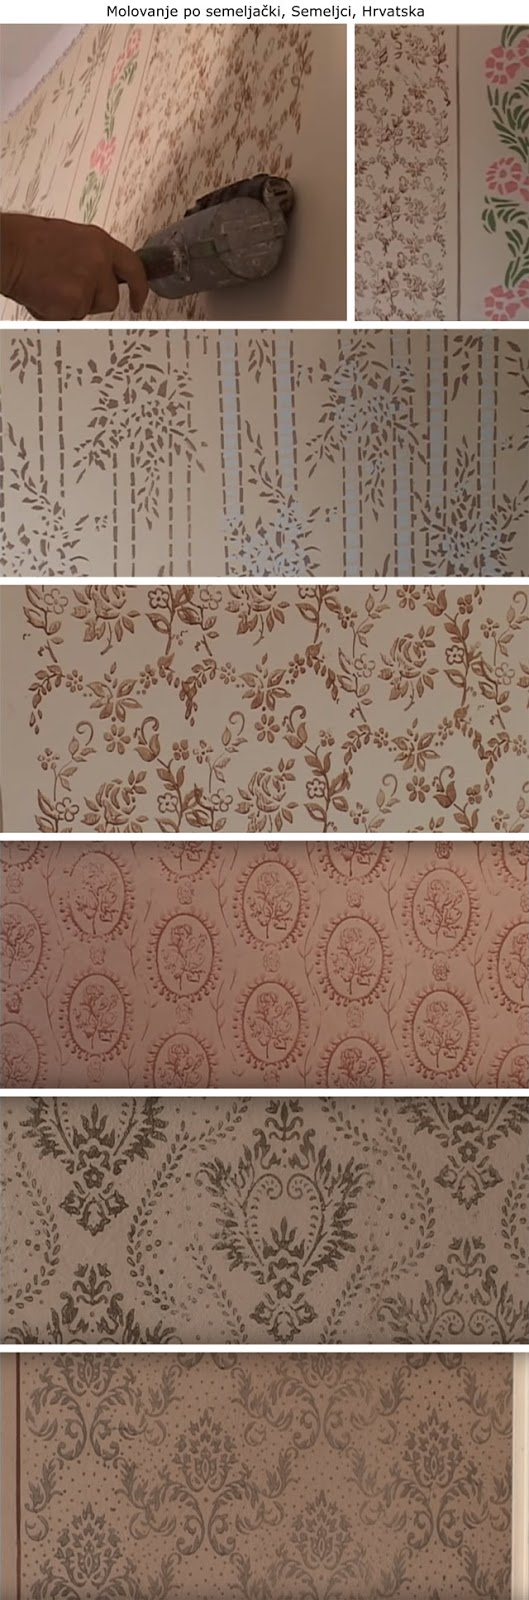 decorazione, rulli decorativi vintage, wall painting, vintage patterned paint rollers, starinski reljefni valjci za moleraj, šabloni, mustre